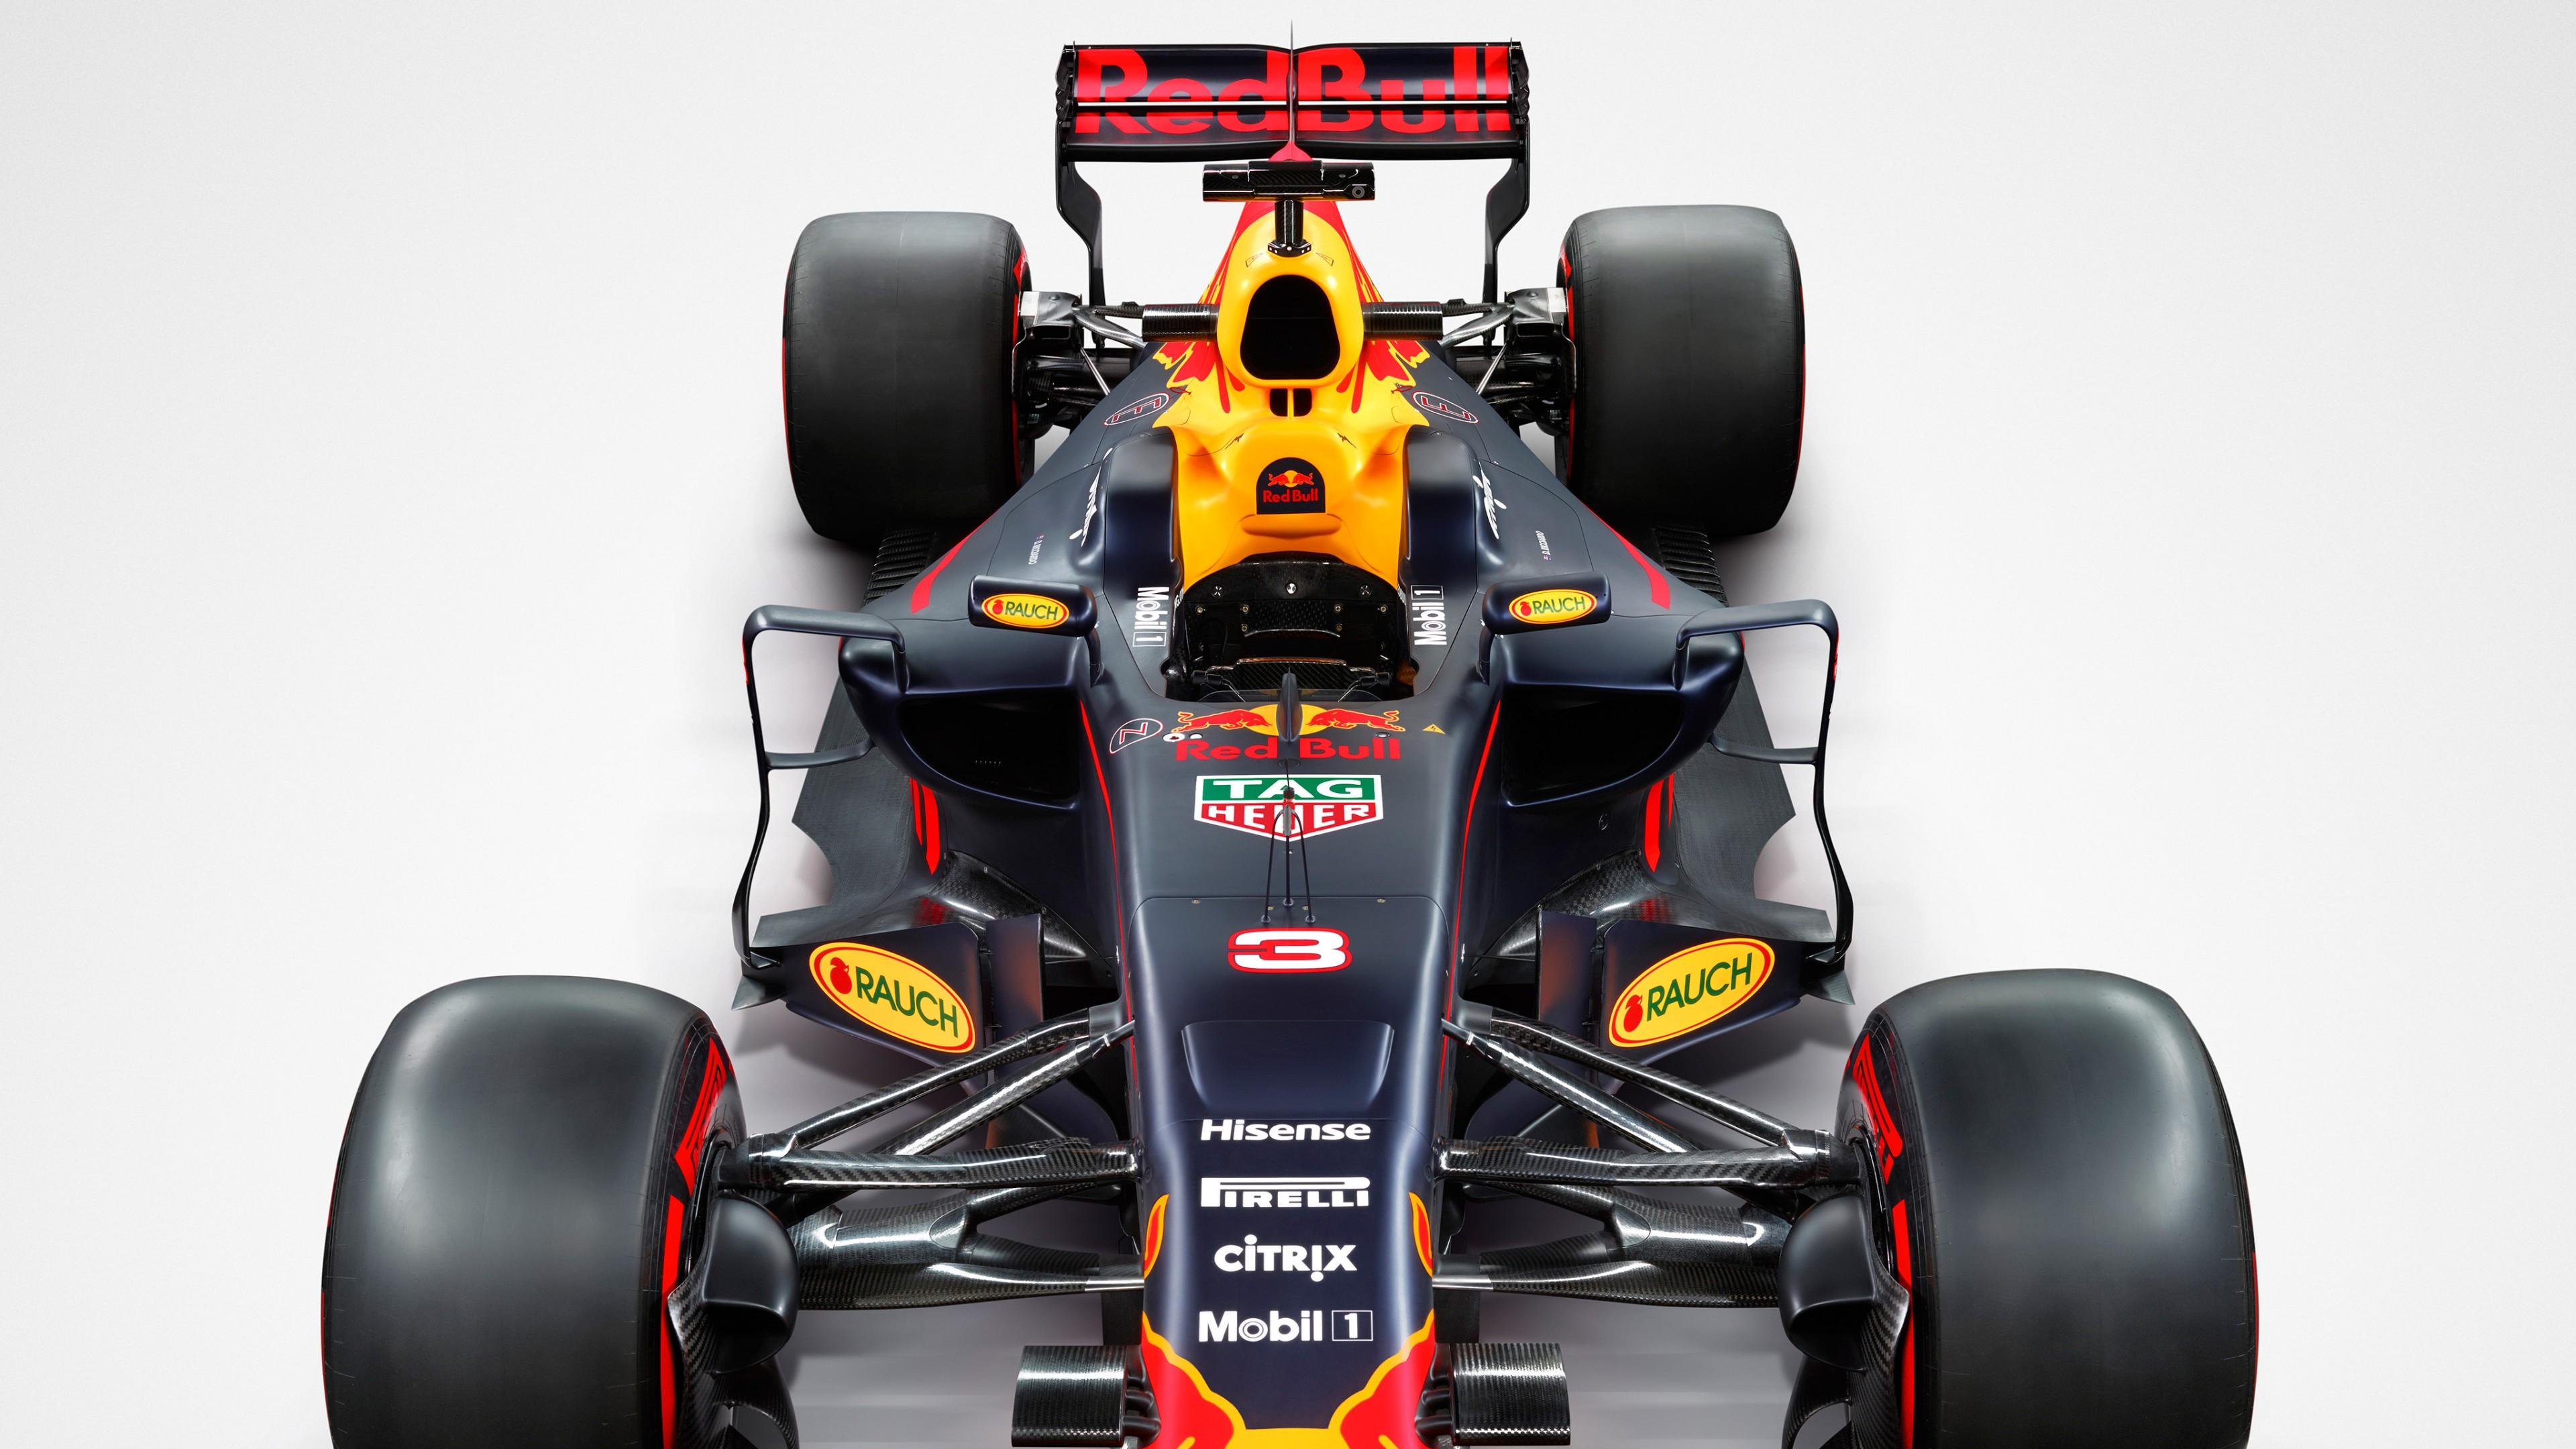 Red Bull RB13 2017 Formula 1 Car 4K Wallpaper   HD Car ...